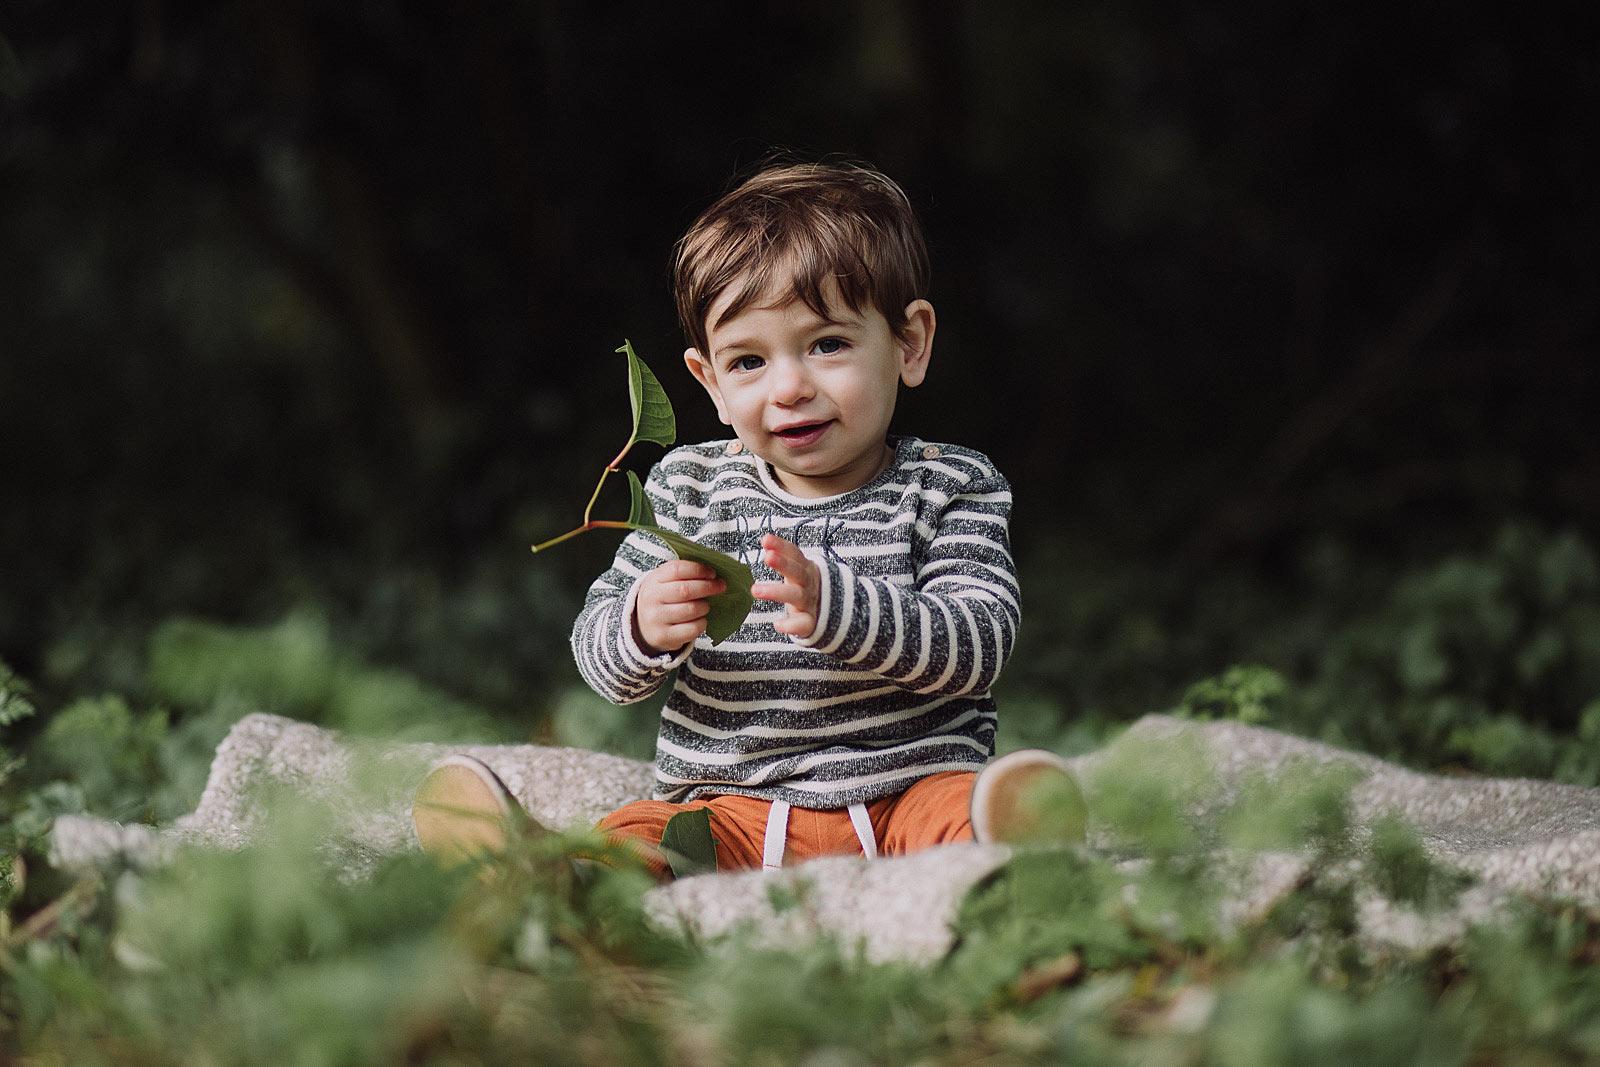 beste kinderfotografie amsterdam